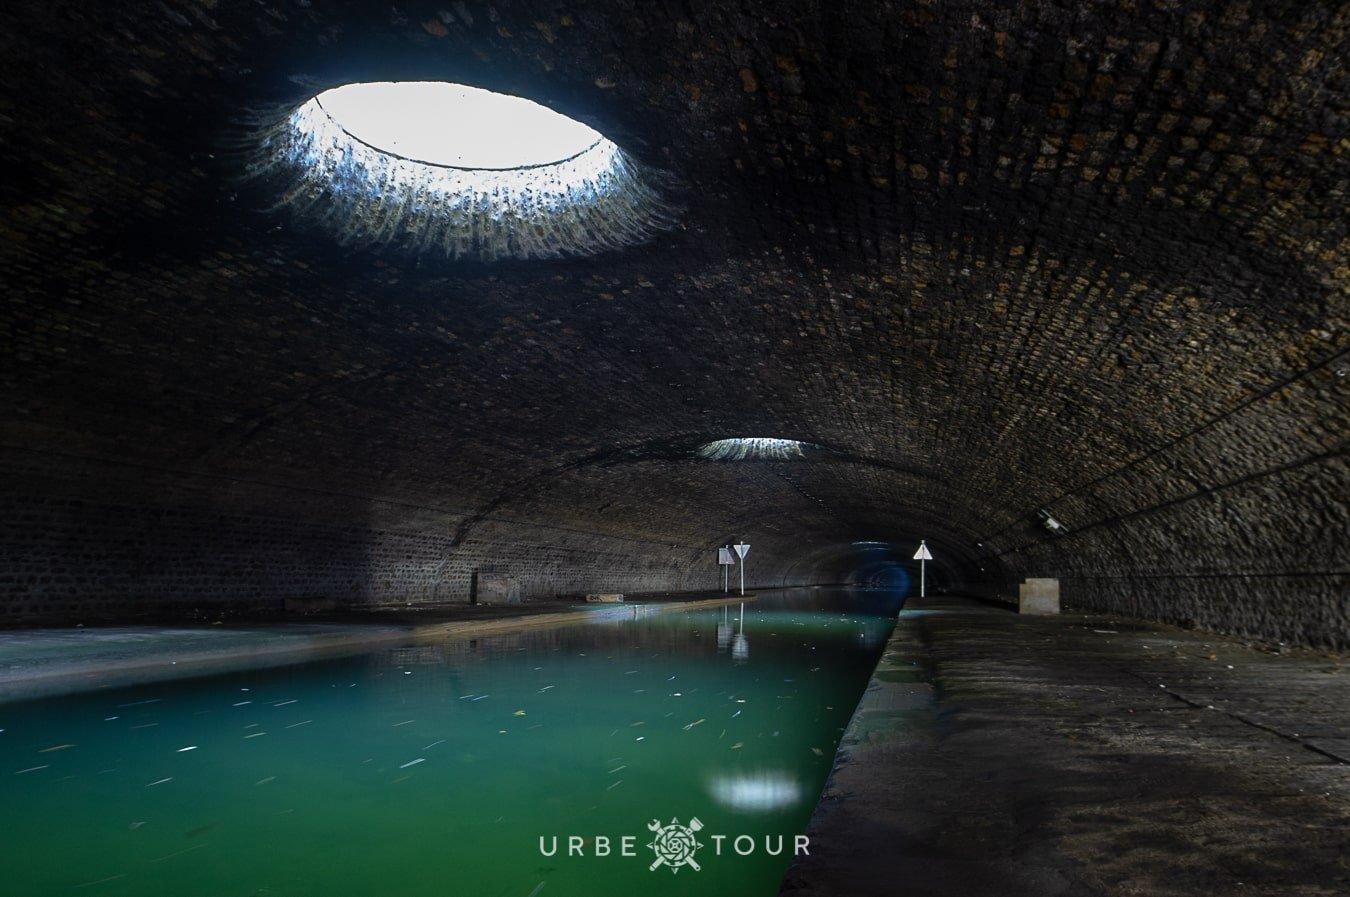 urbex-paris-saint-martin-3-min Огромная подземная река под Парижем: канал Сен-Мартен